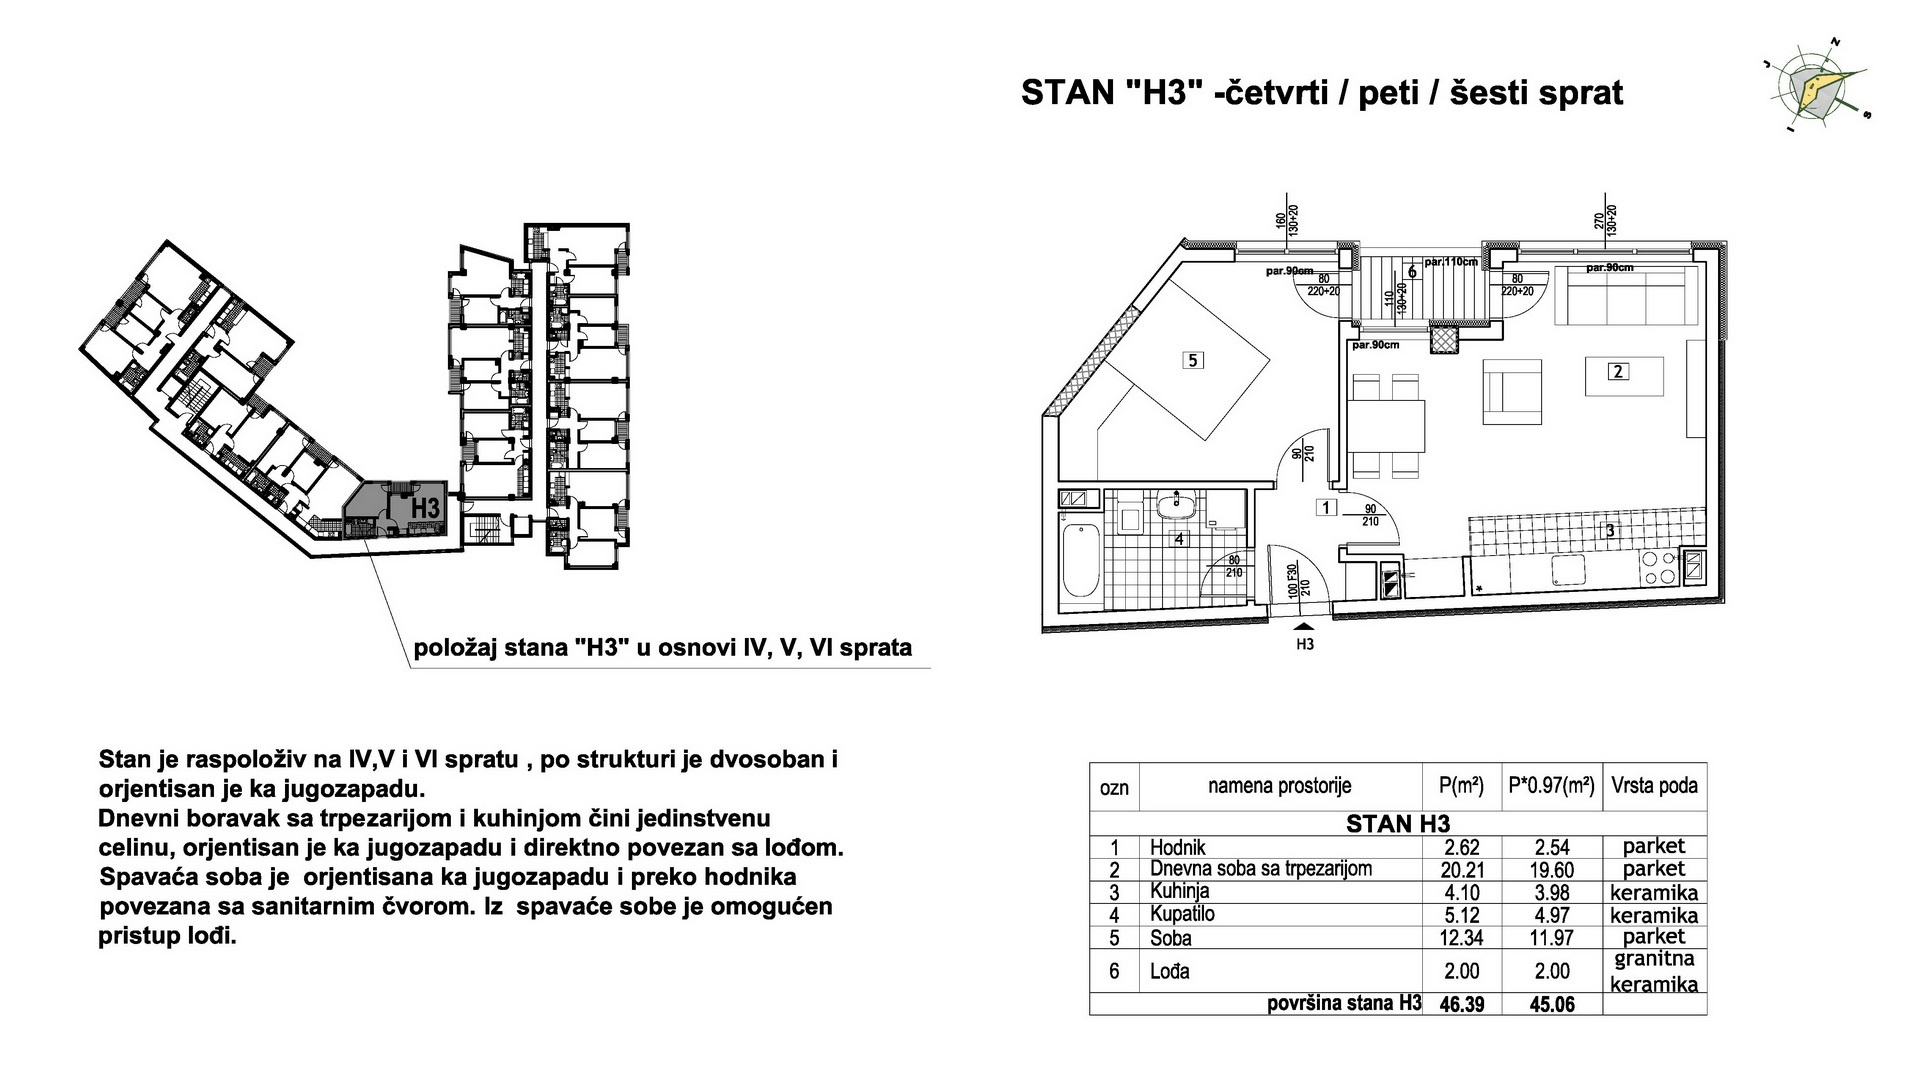 Objekat u Prešernovoj bb - Stan H3